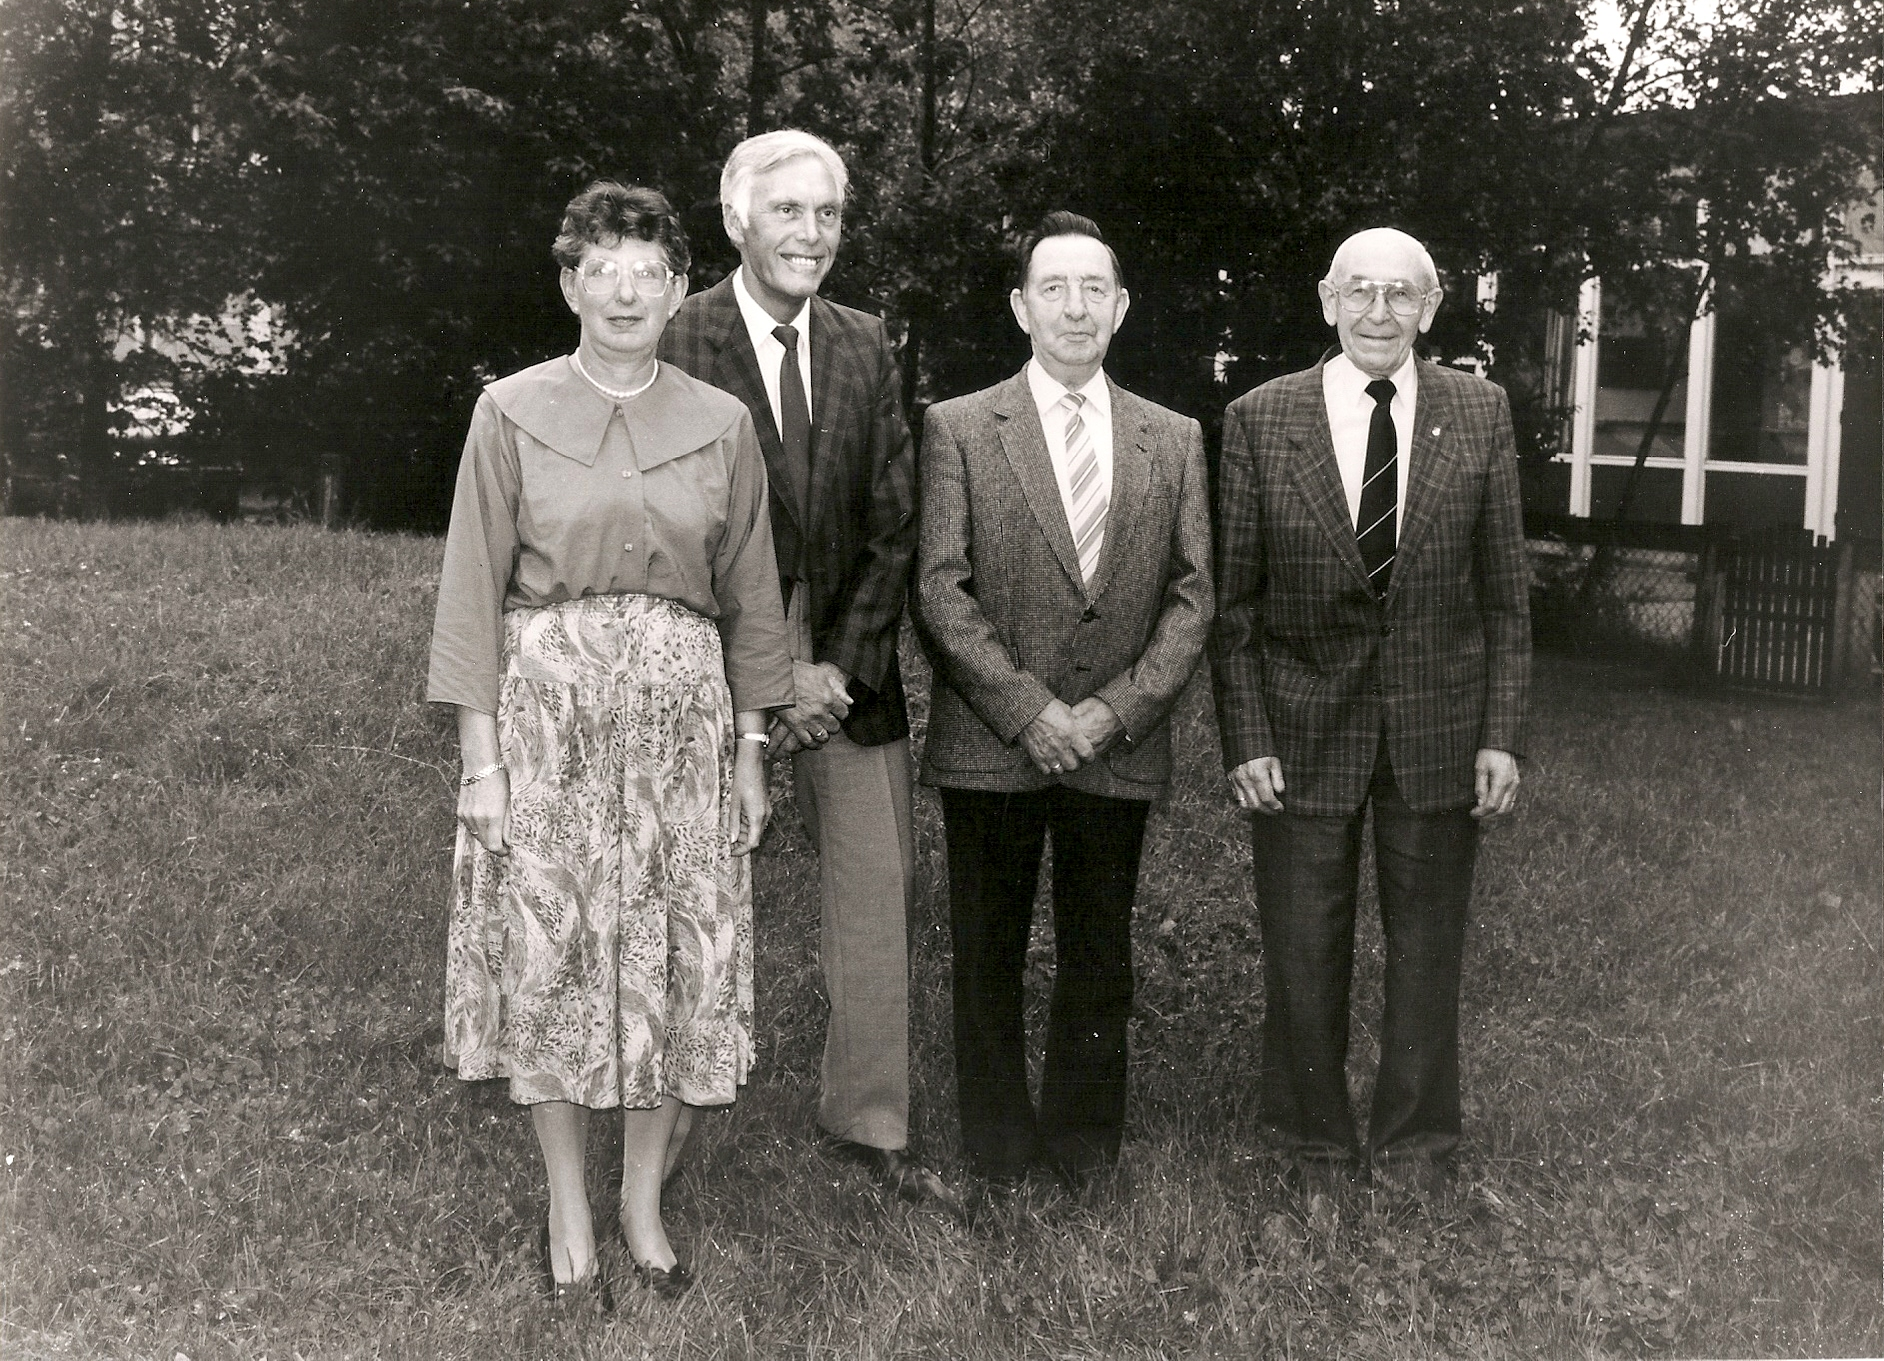 1991 leden van het eerste uur SOVV, vlnr Jo Dekker, Nardus Dekker, Hendrik Rouwenhorst, Jan Dekker